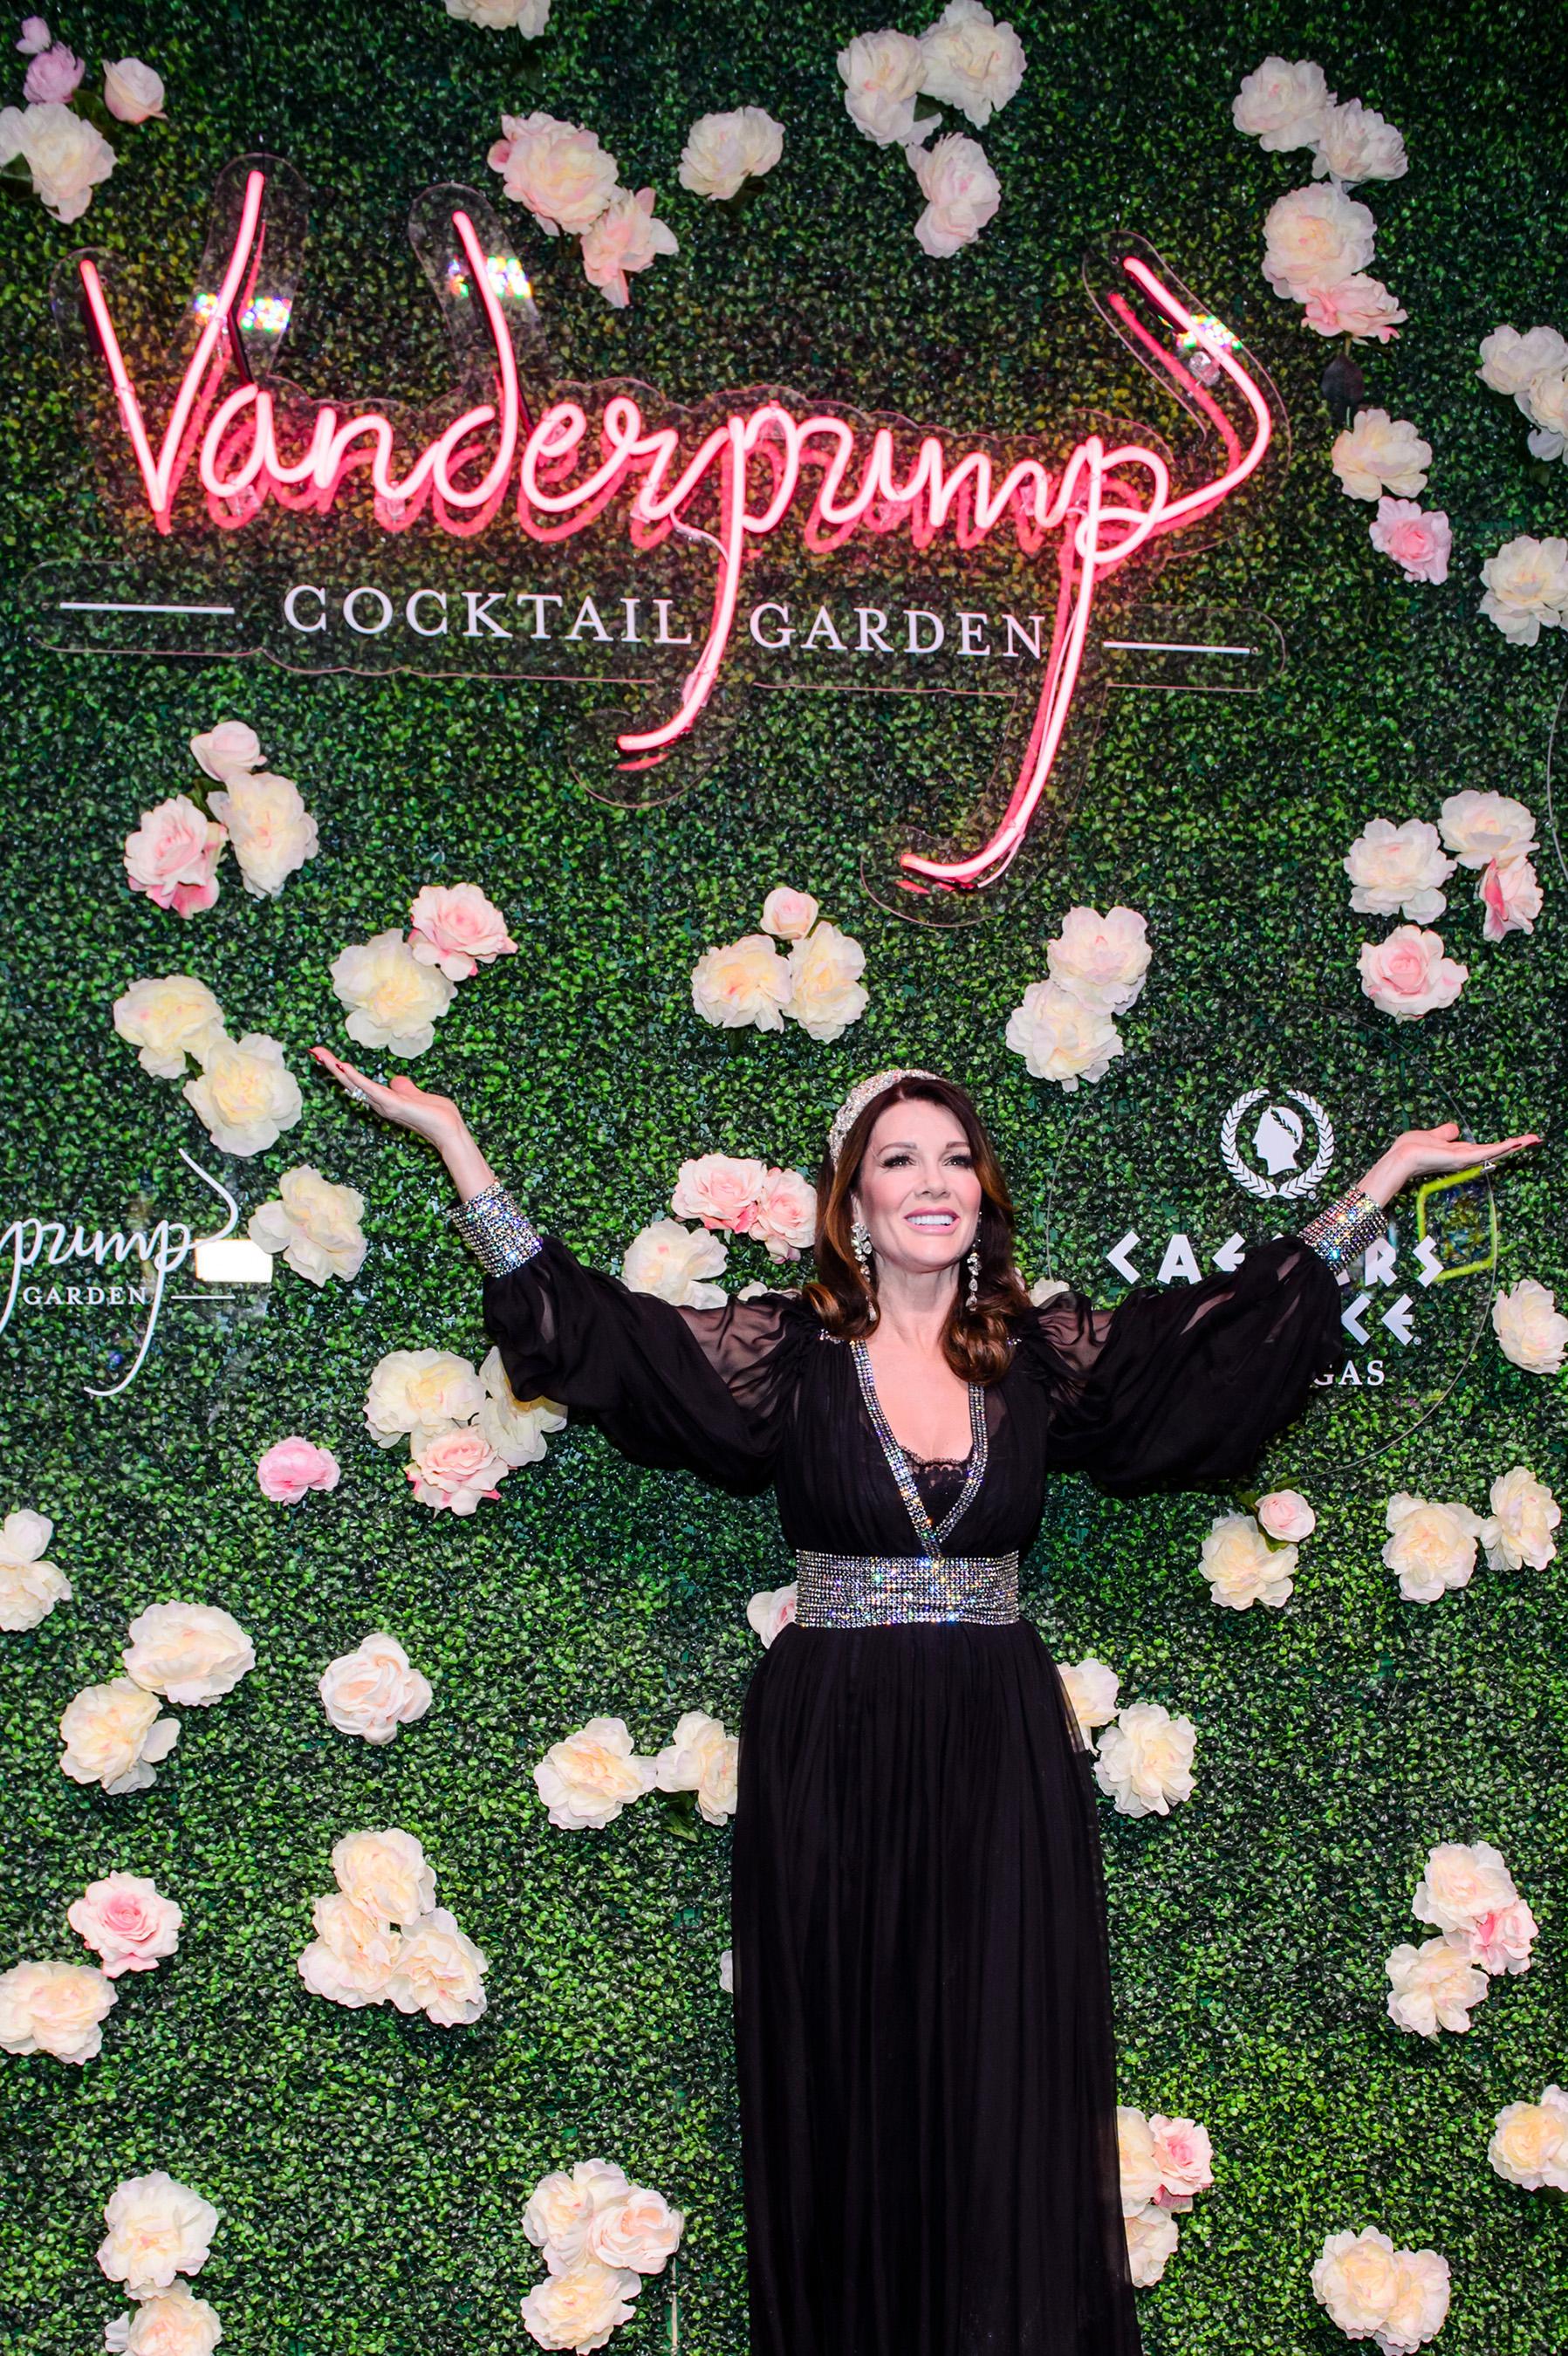 Lisa Vanderpump celebrates the grand opening of Vanderpump Cocktail Garden at Caesars Palace.